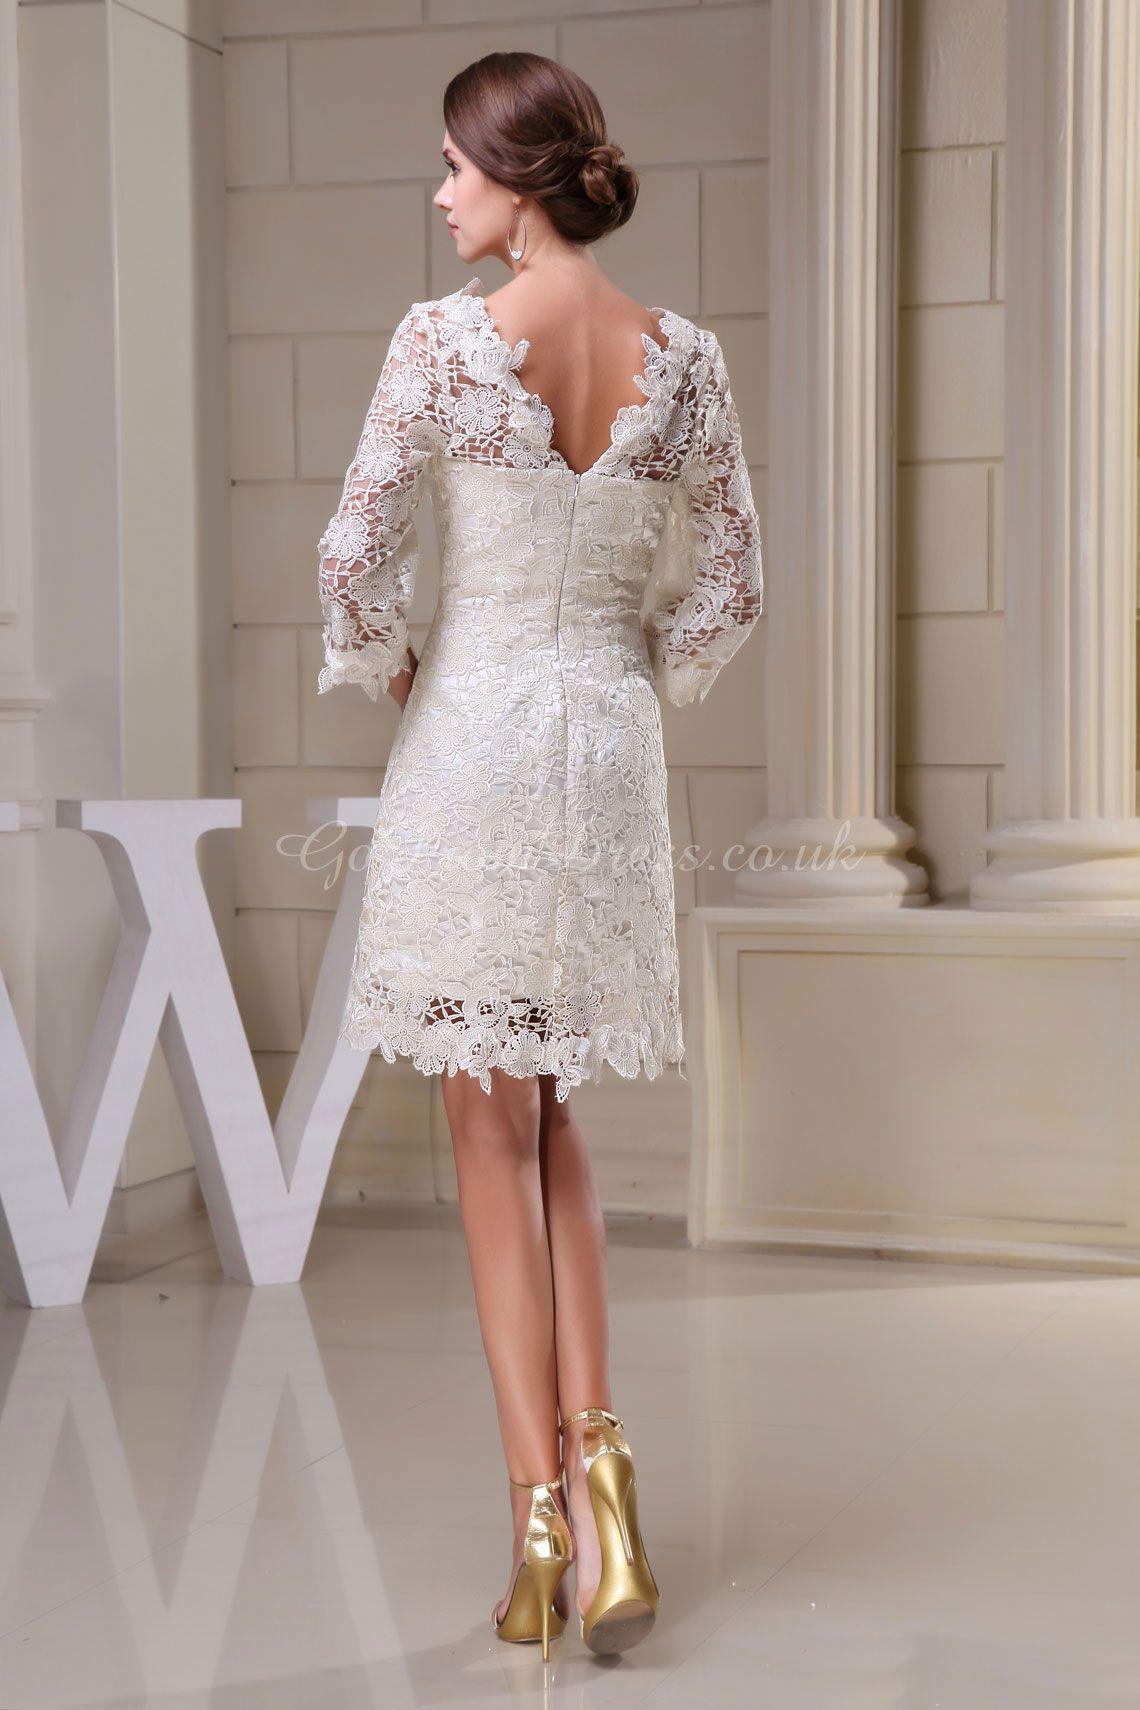 Knee Length Wedding Dresses with Sleeves | Dress With Sleeves Knee ...